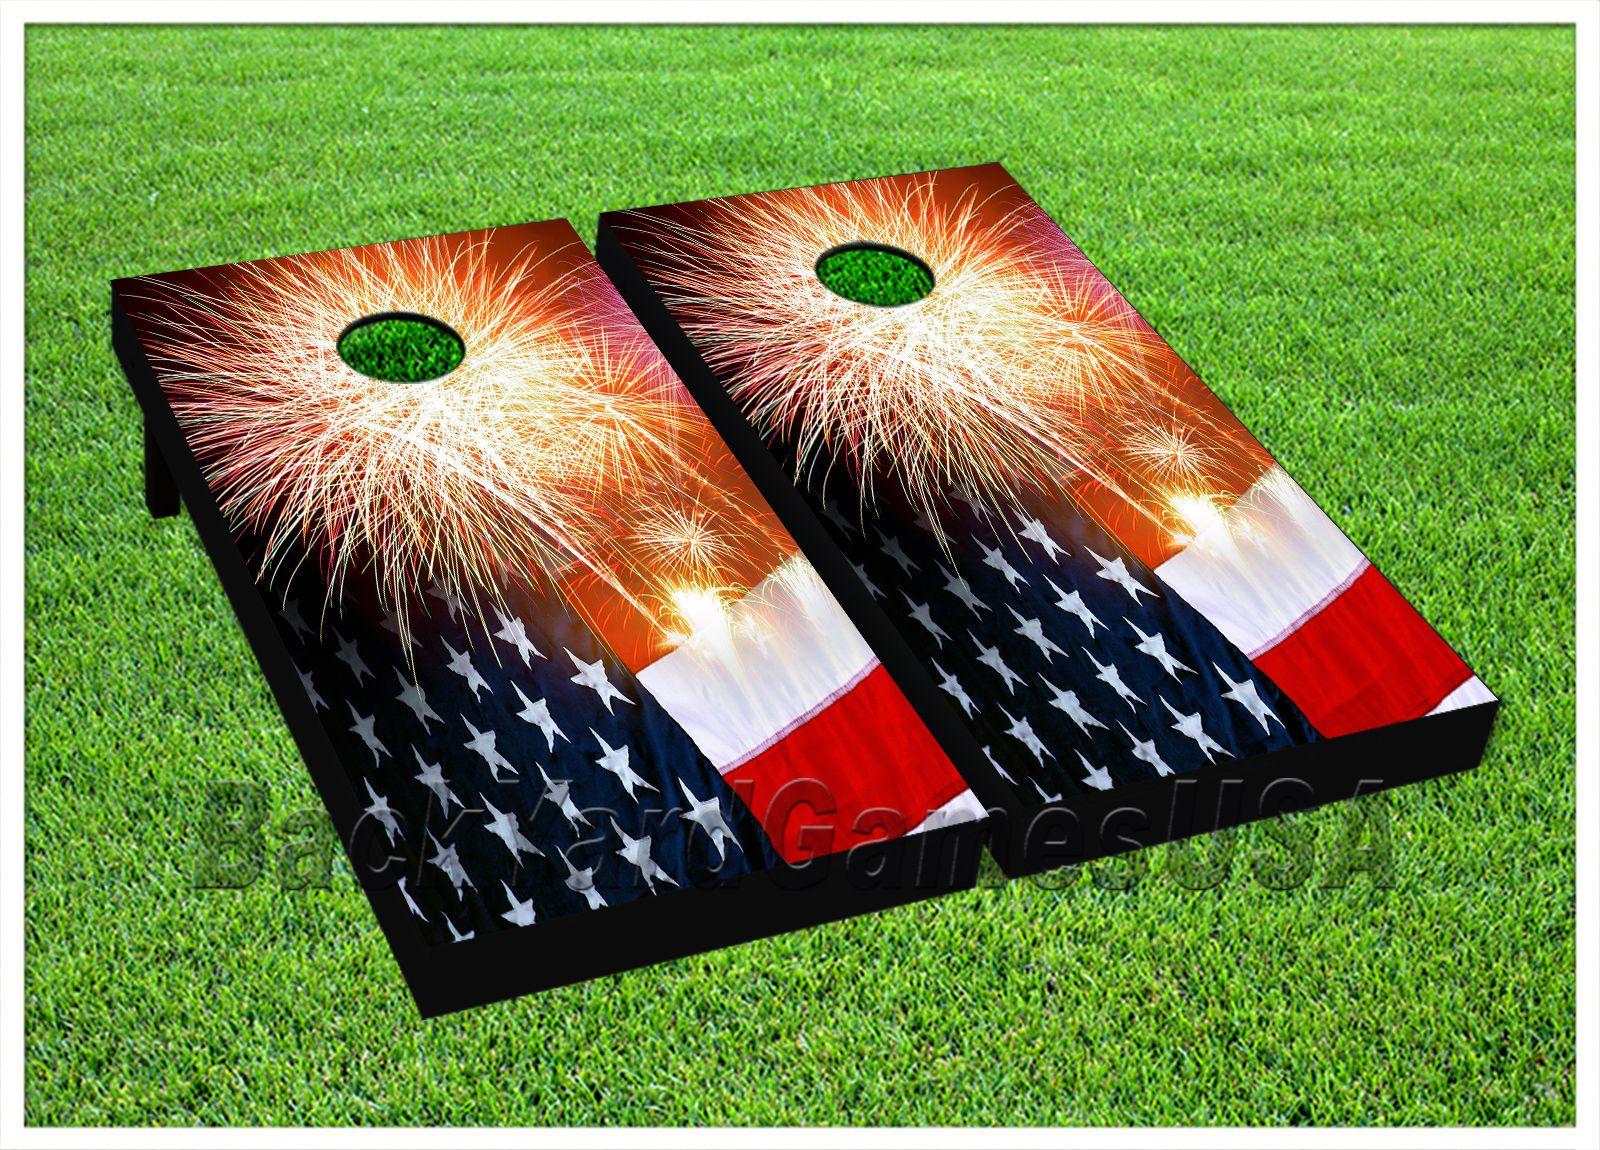 LAMINATED American Flag Vintage look Cornhole Board Skin Wrap Decal Set Vinyl